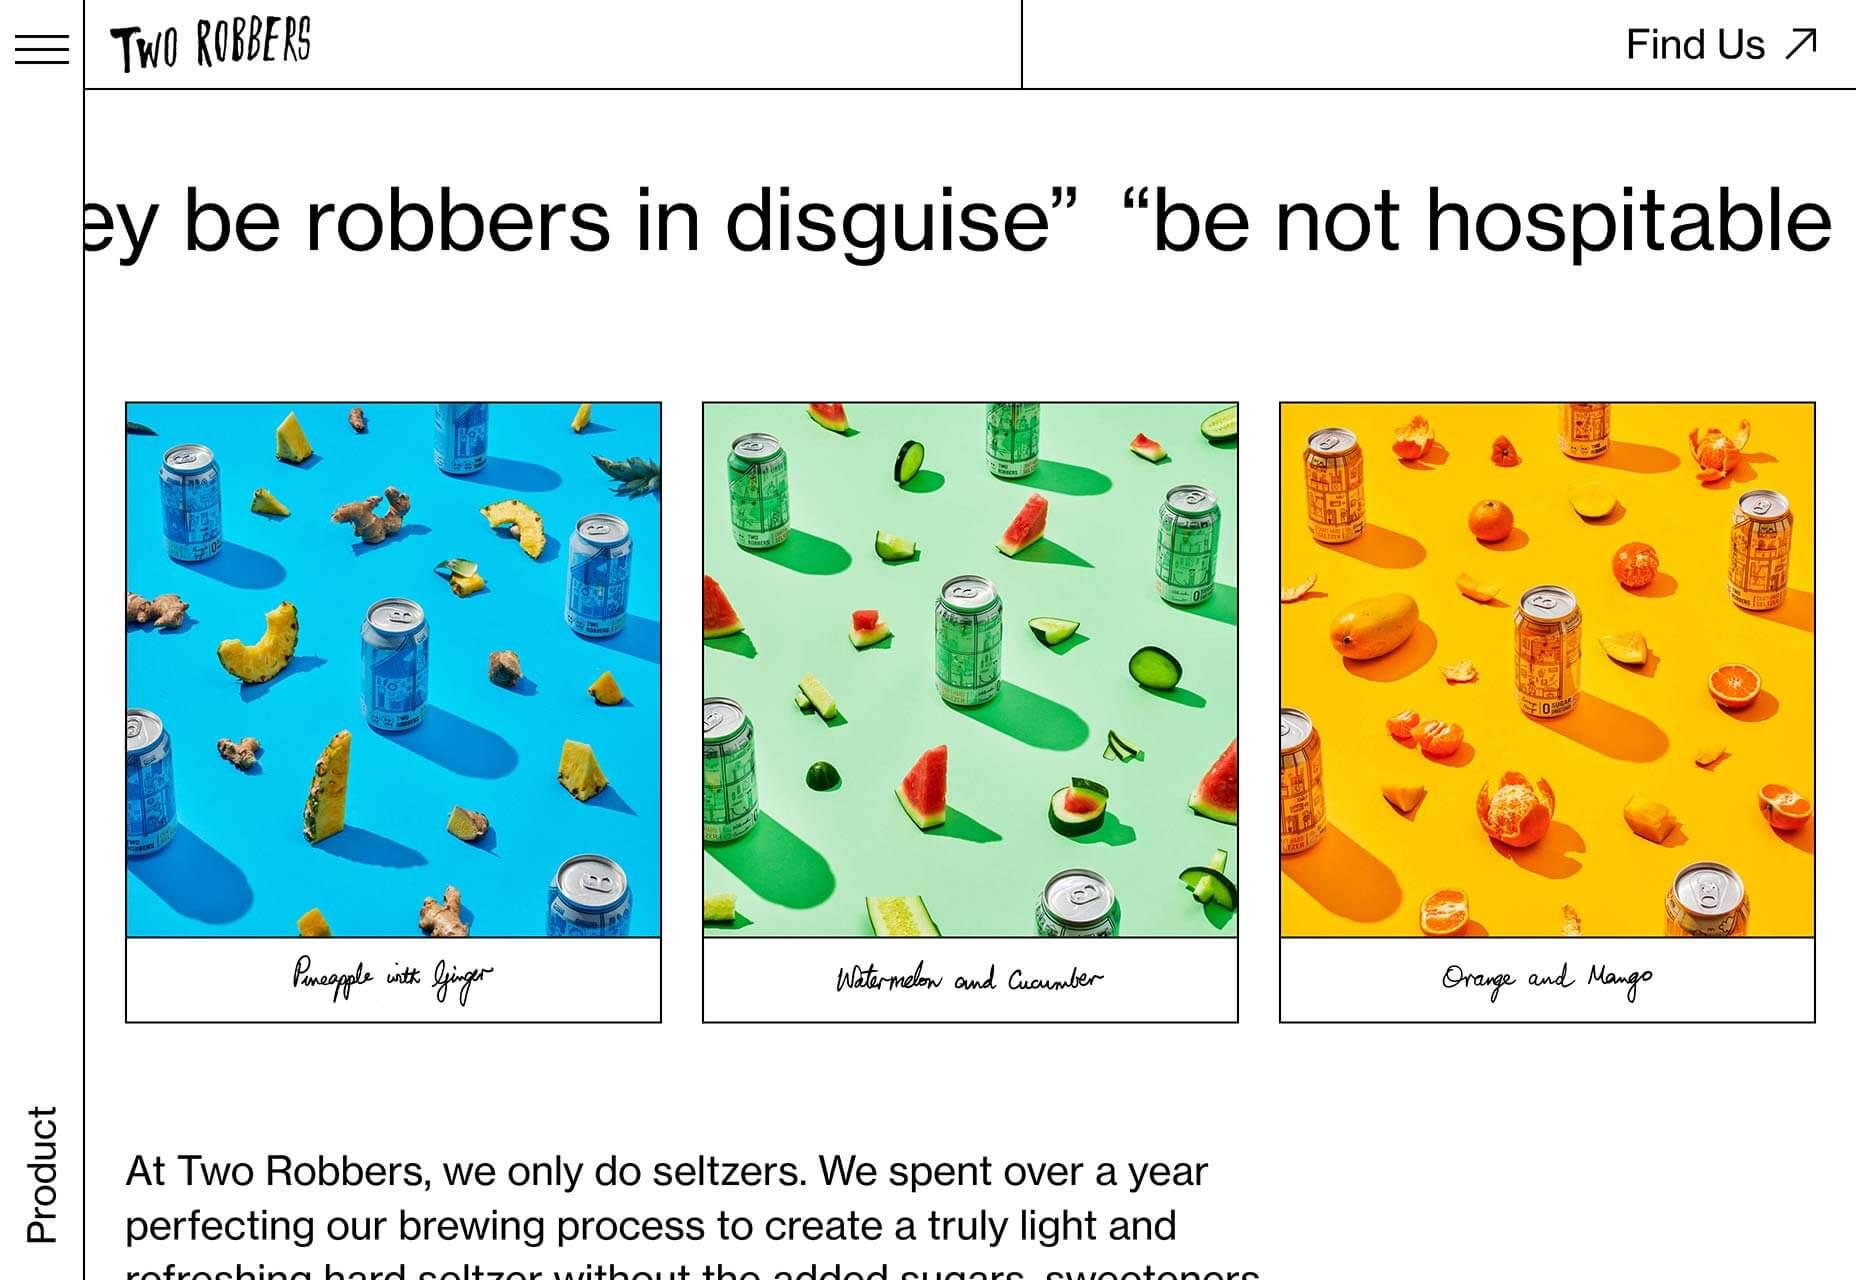 019-tworobbers